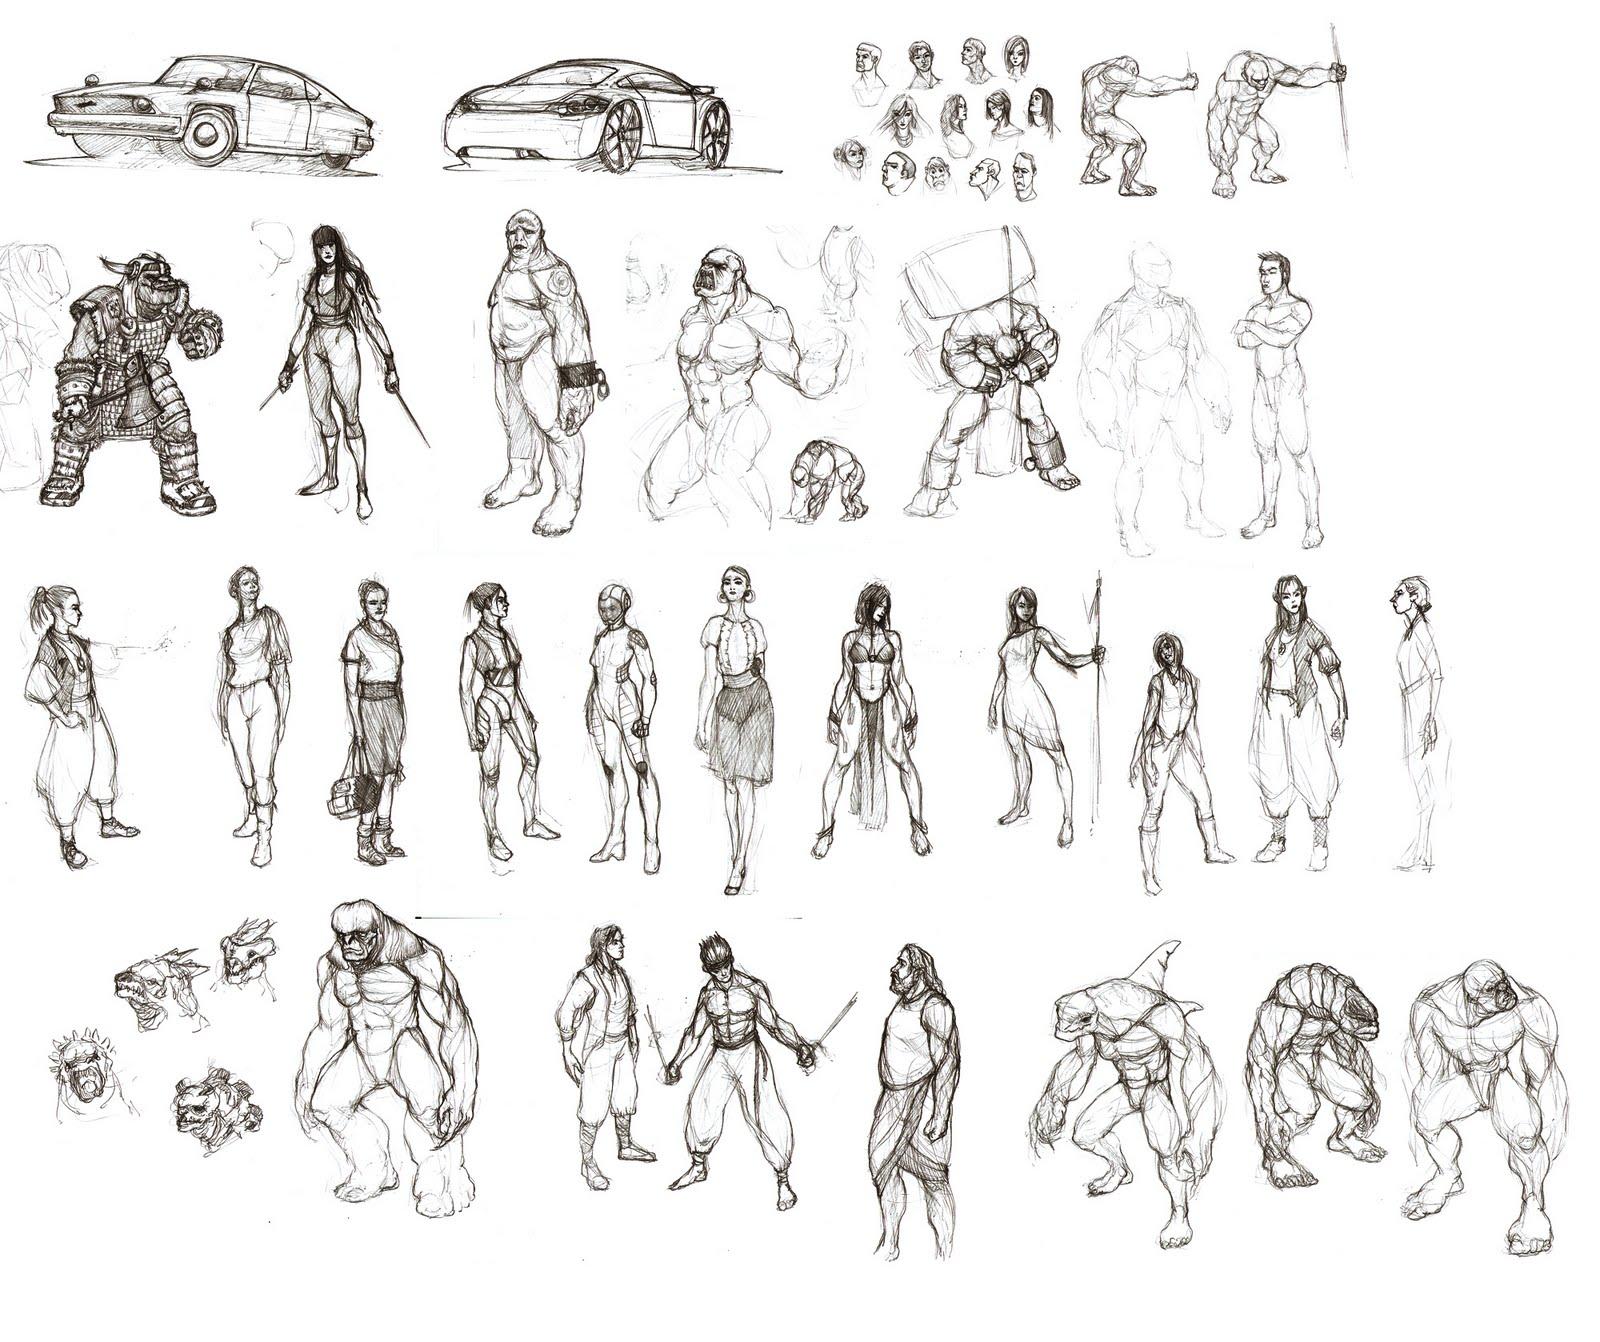 Character Design Study : Arthur tanudarta character design study